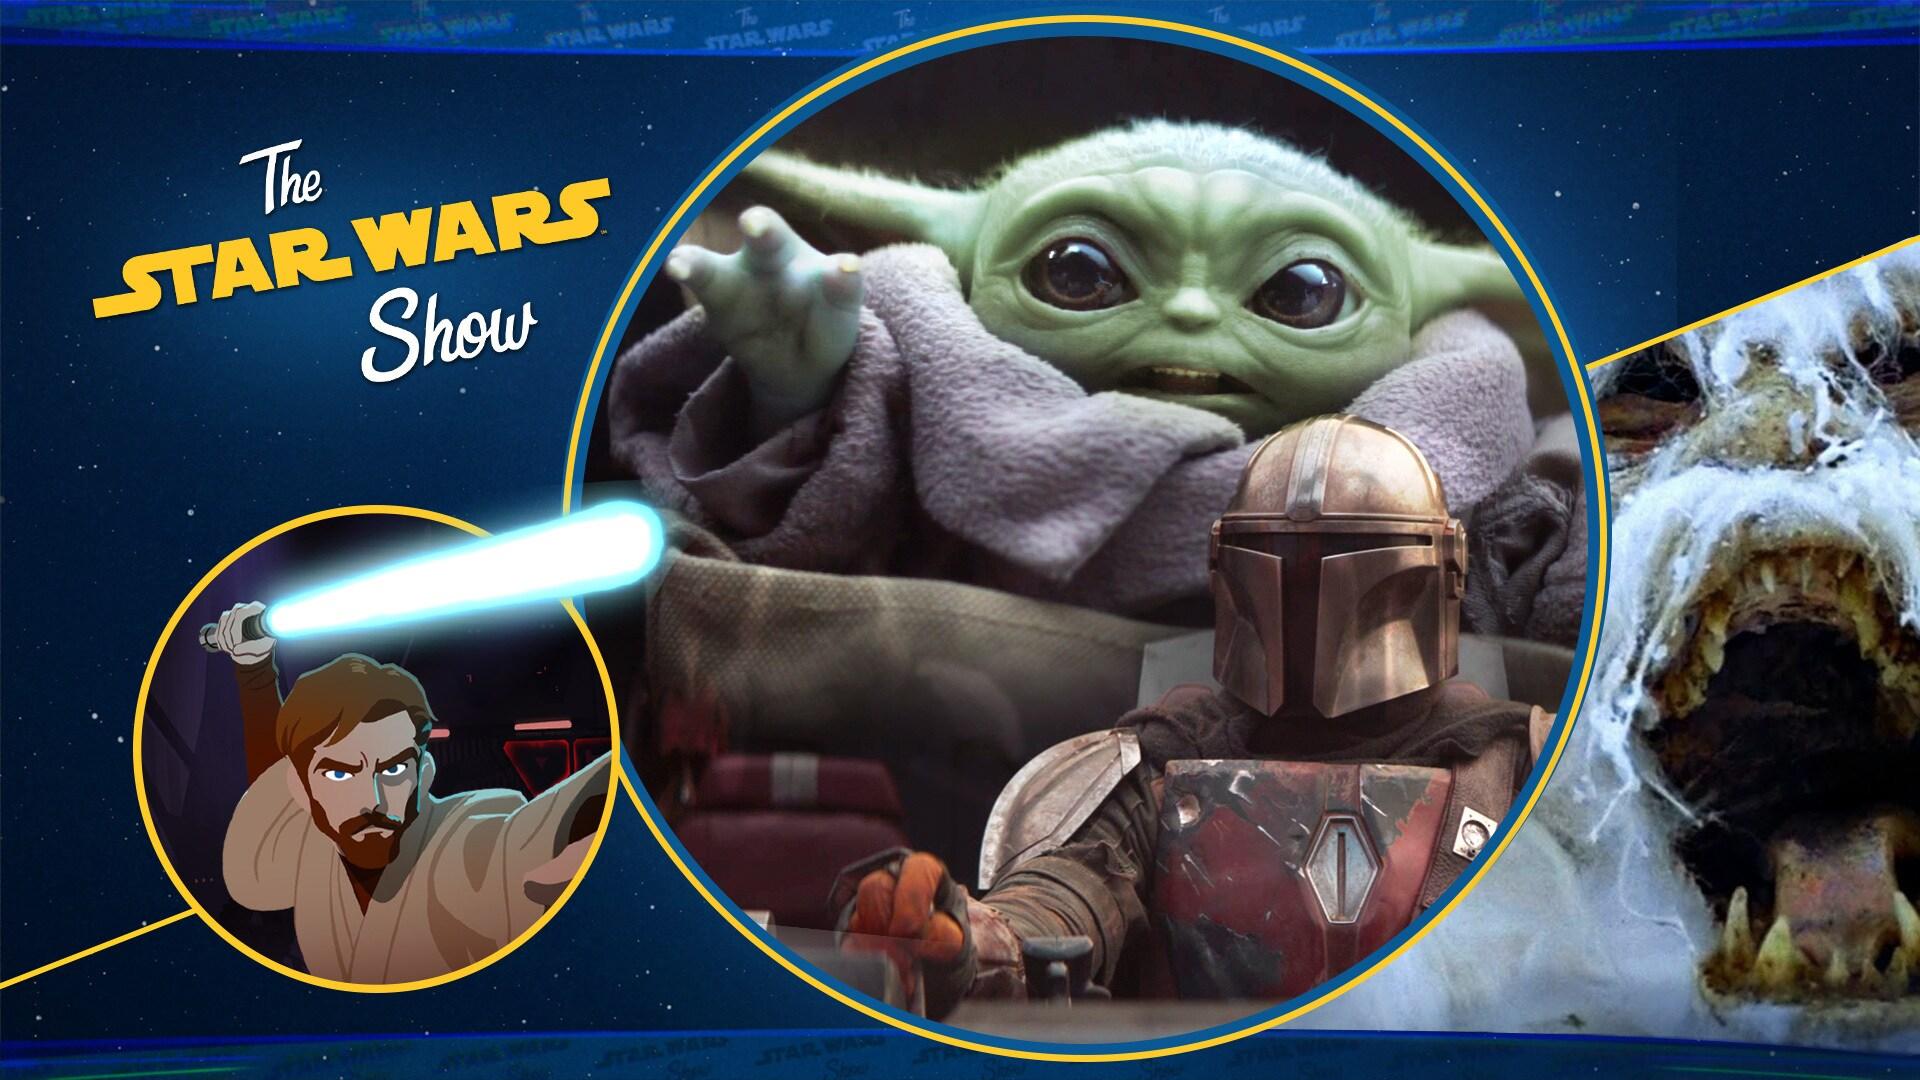 The Star Wars Show Halloween Scaretacular!